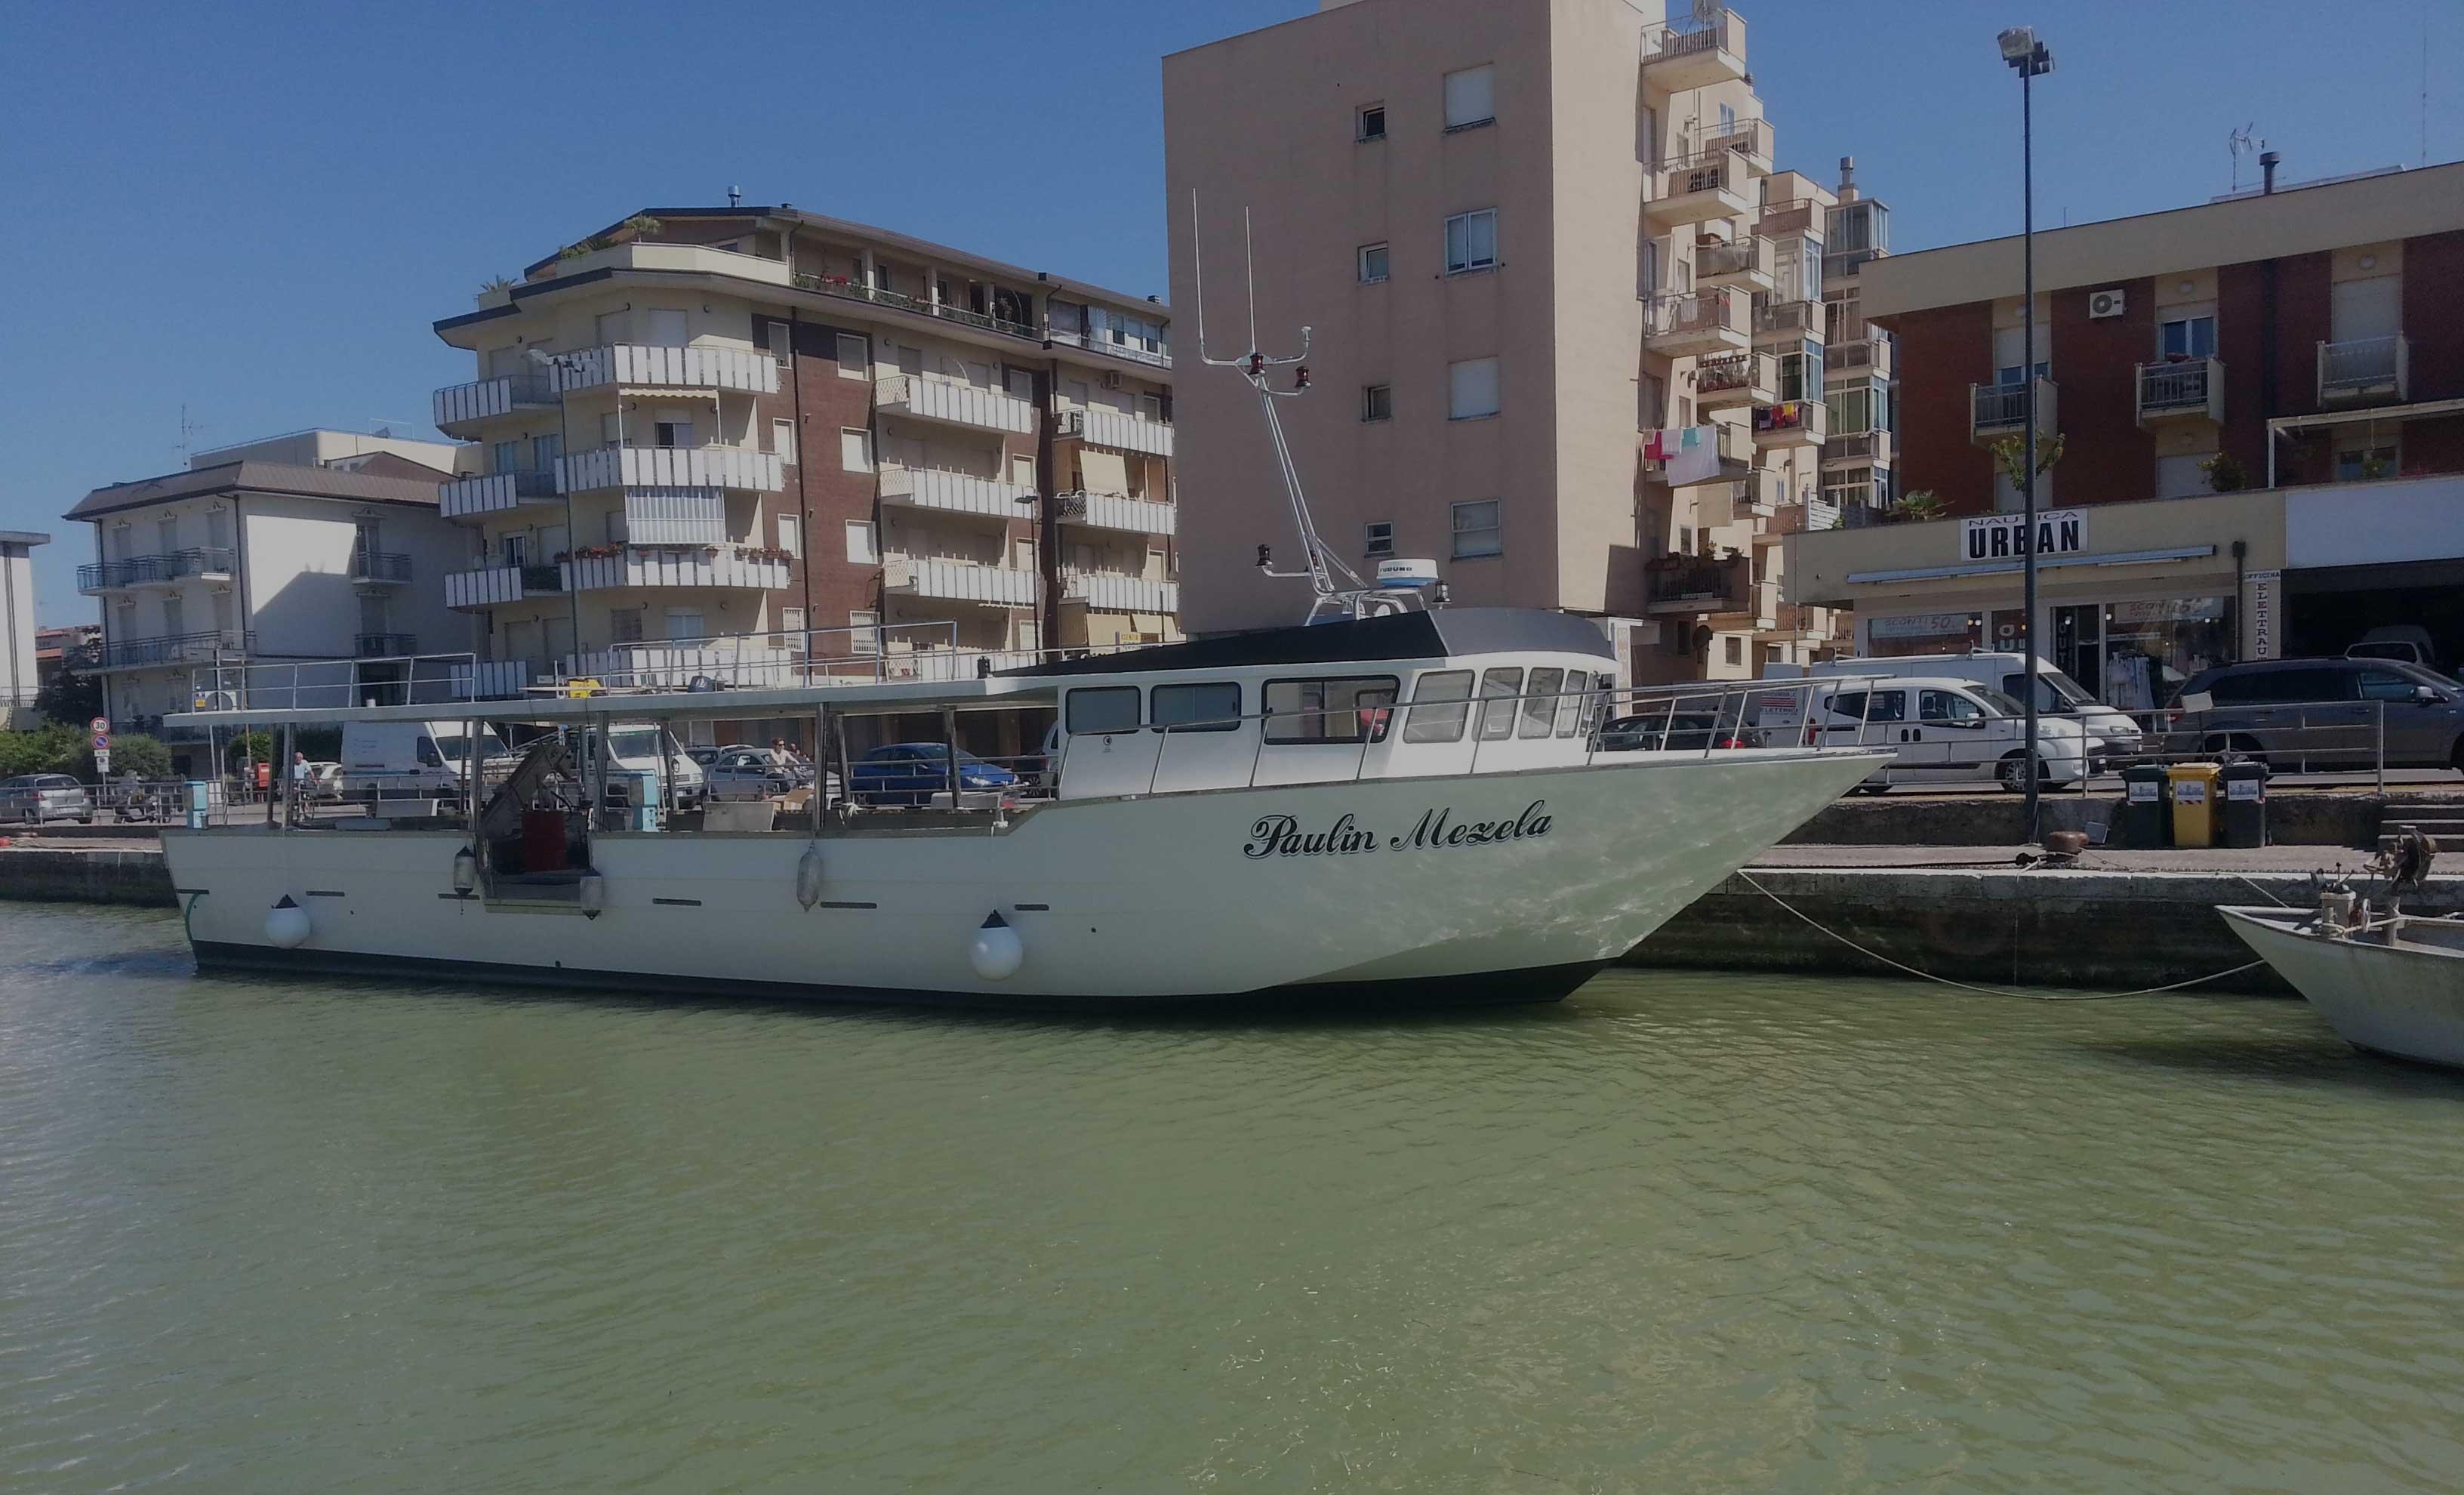 paulin mezela, barca raccolta molluschi, miticoltura, cozze